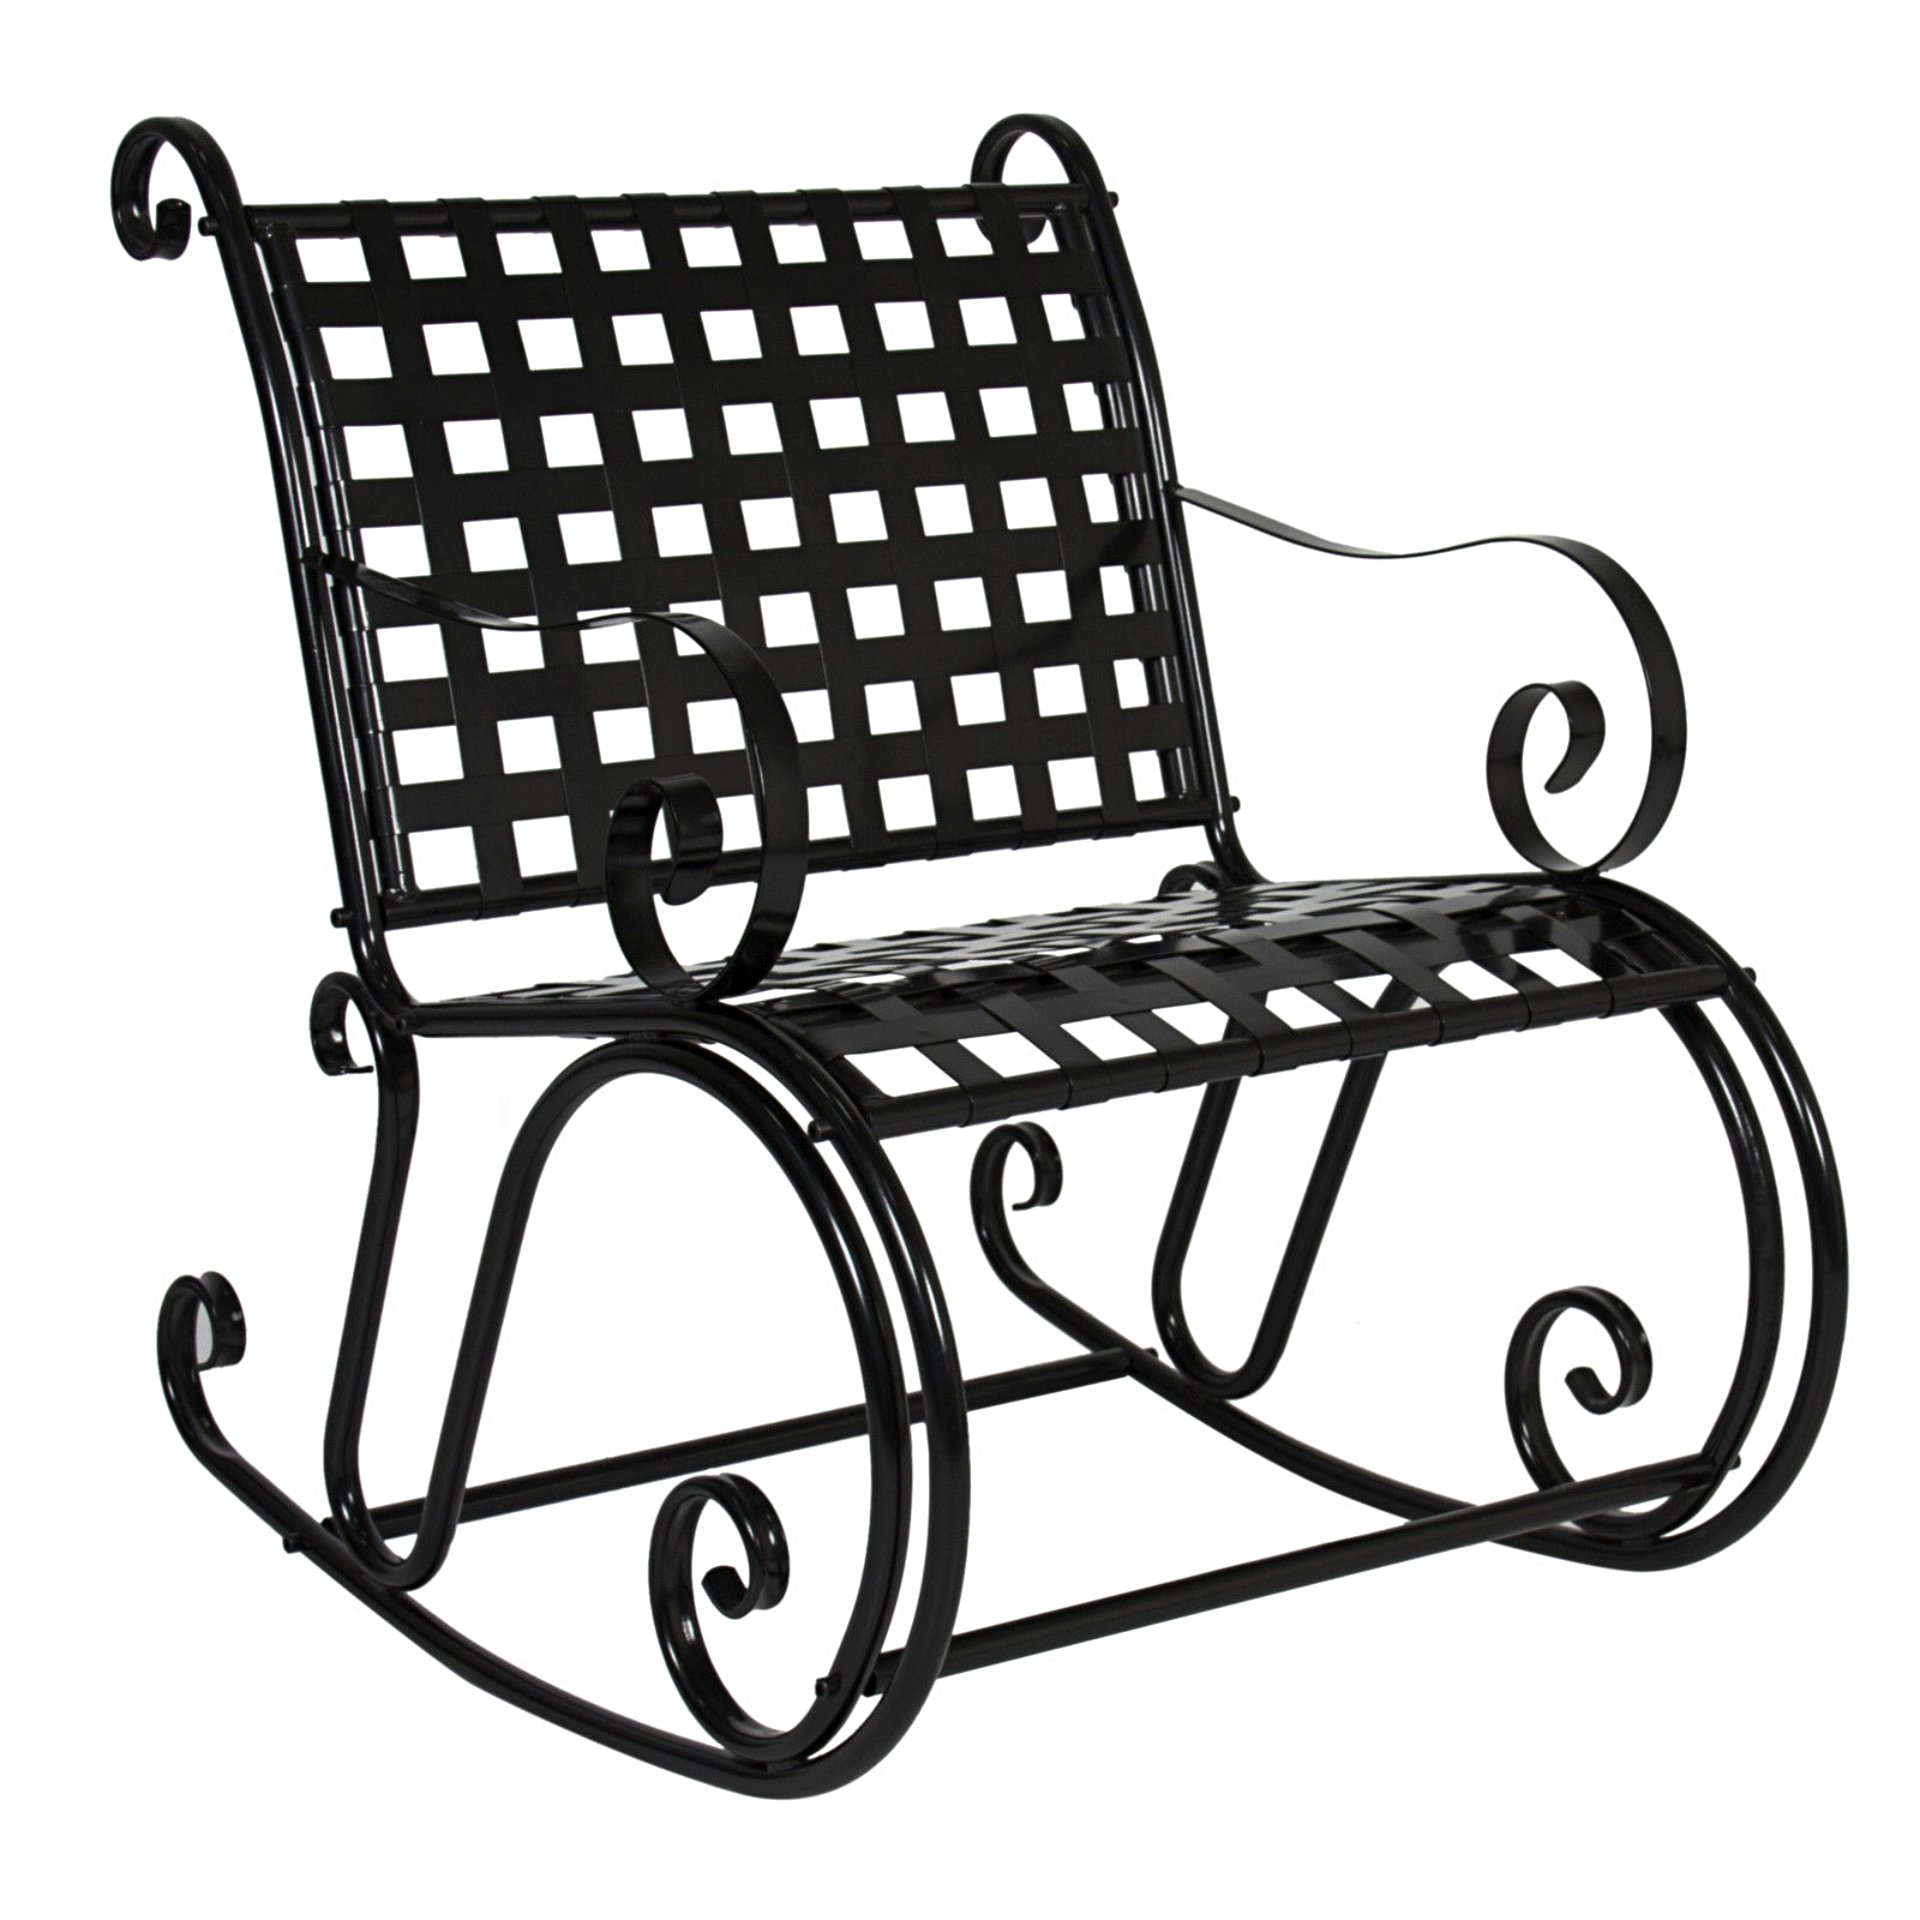 Outdoor Patio Outdoor Solid Iron Scroll Rocker Porch Rocking Chair Backyard Antique Seat Black #269